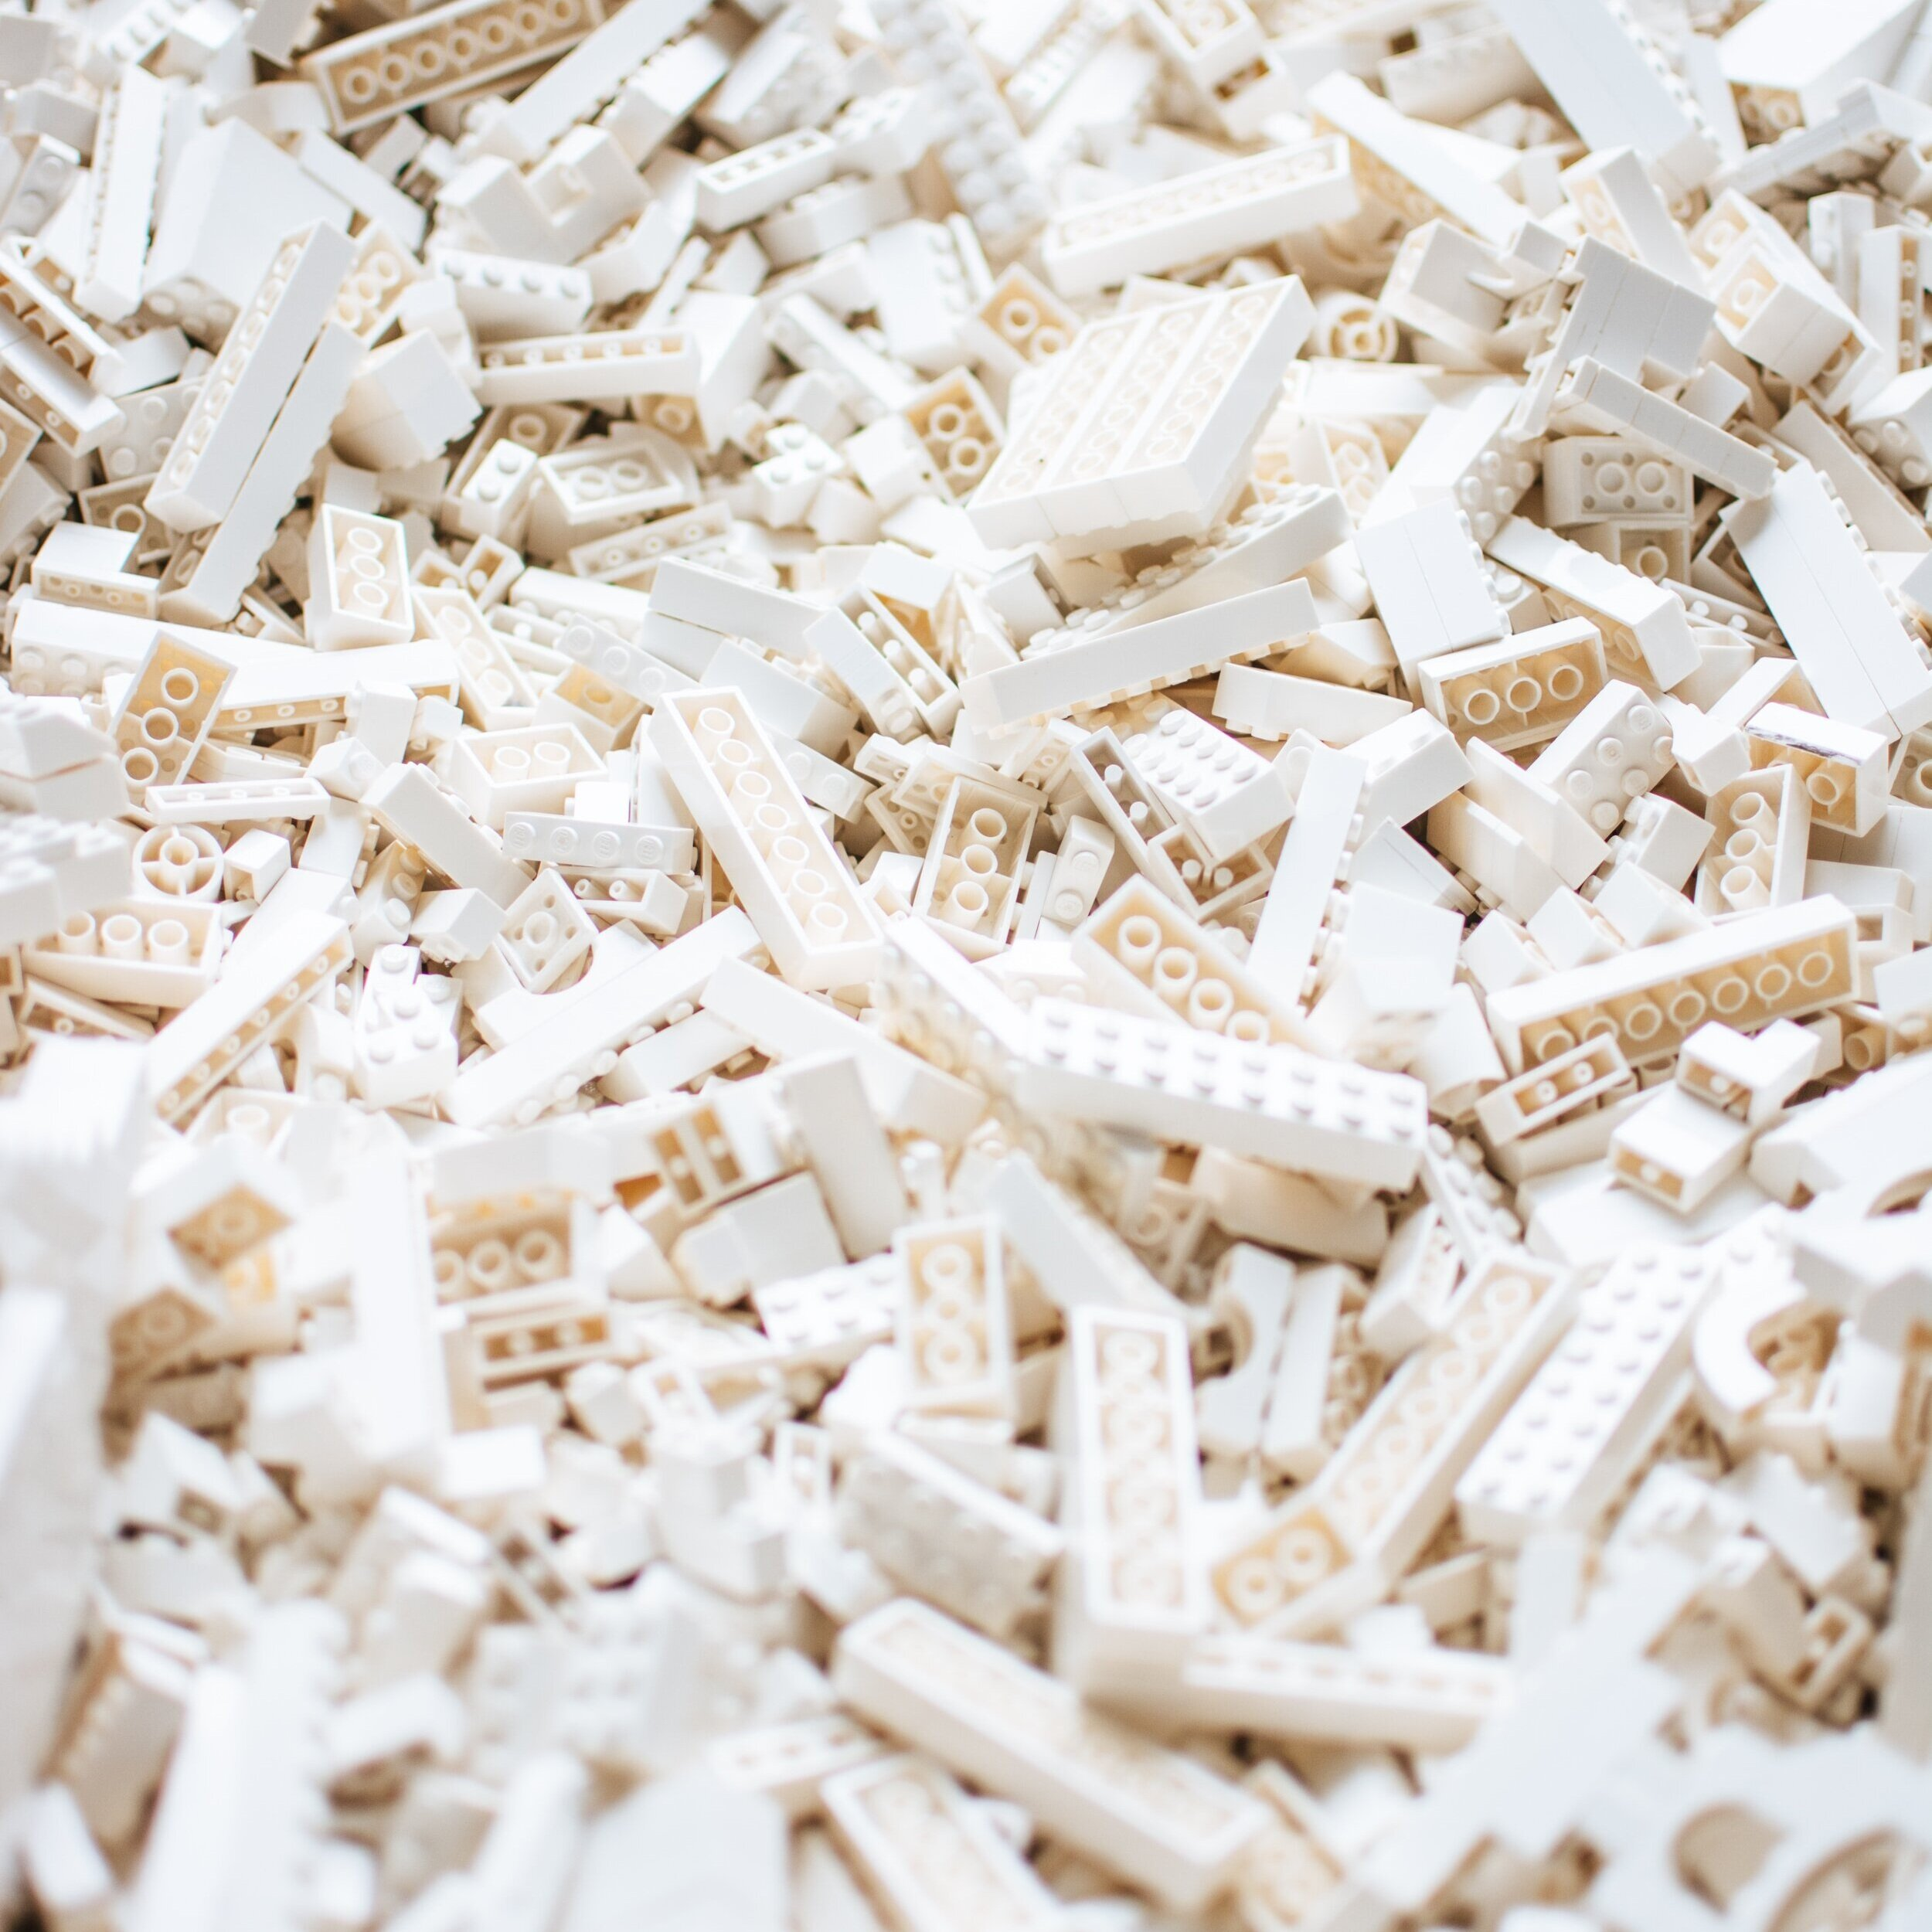 The 25 Coolest LEGO Architecture Sets